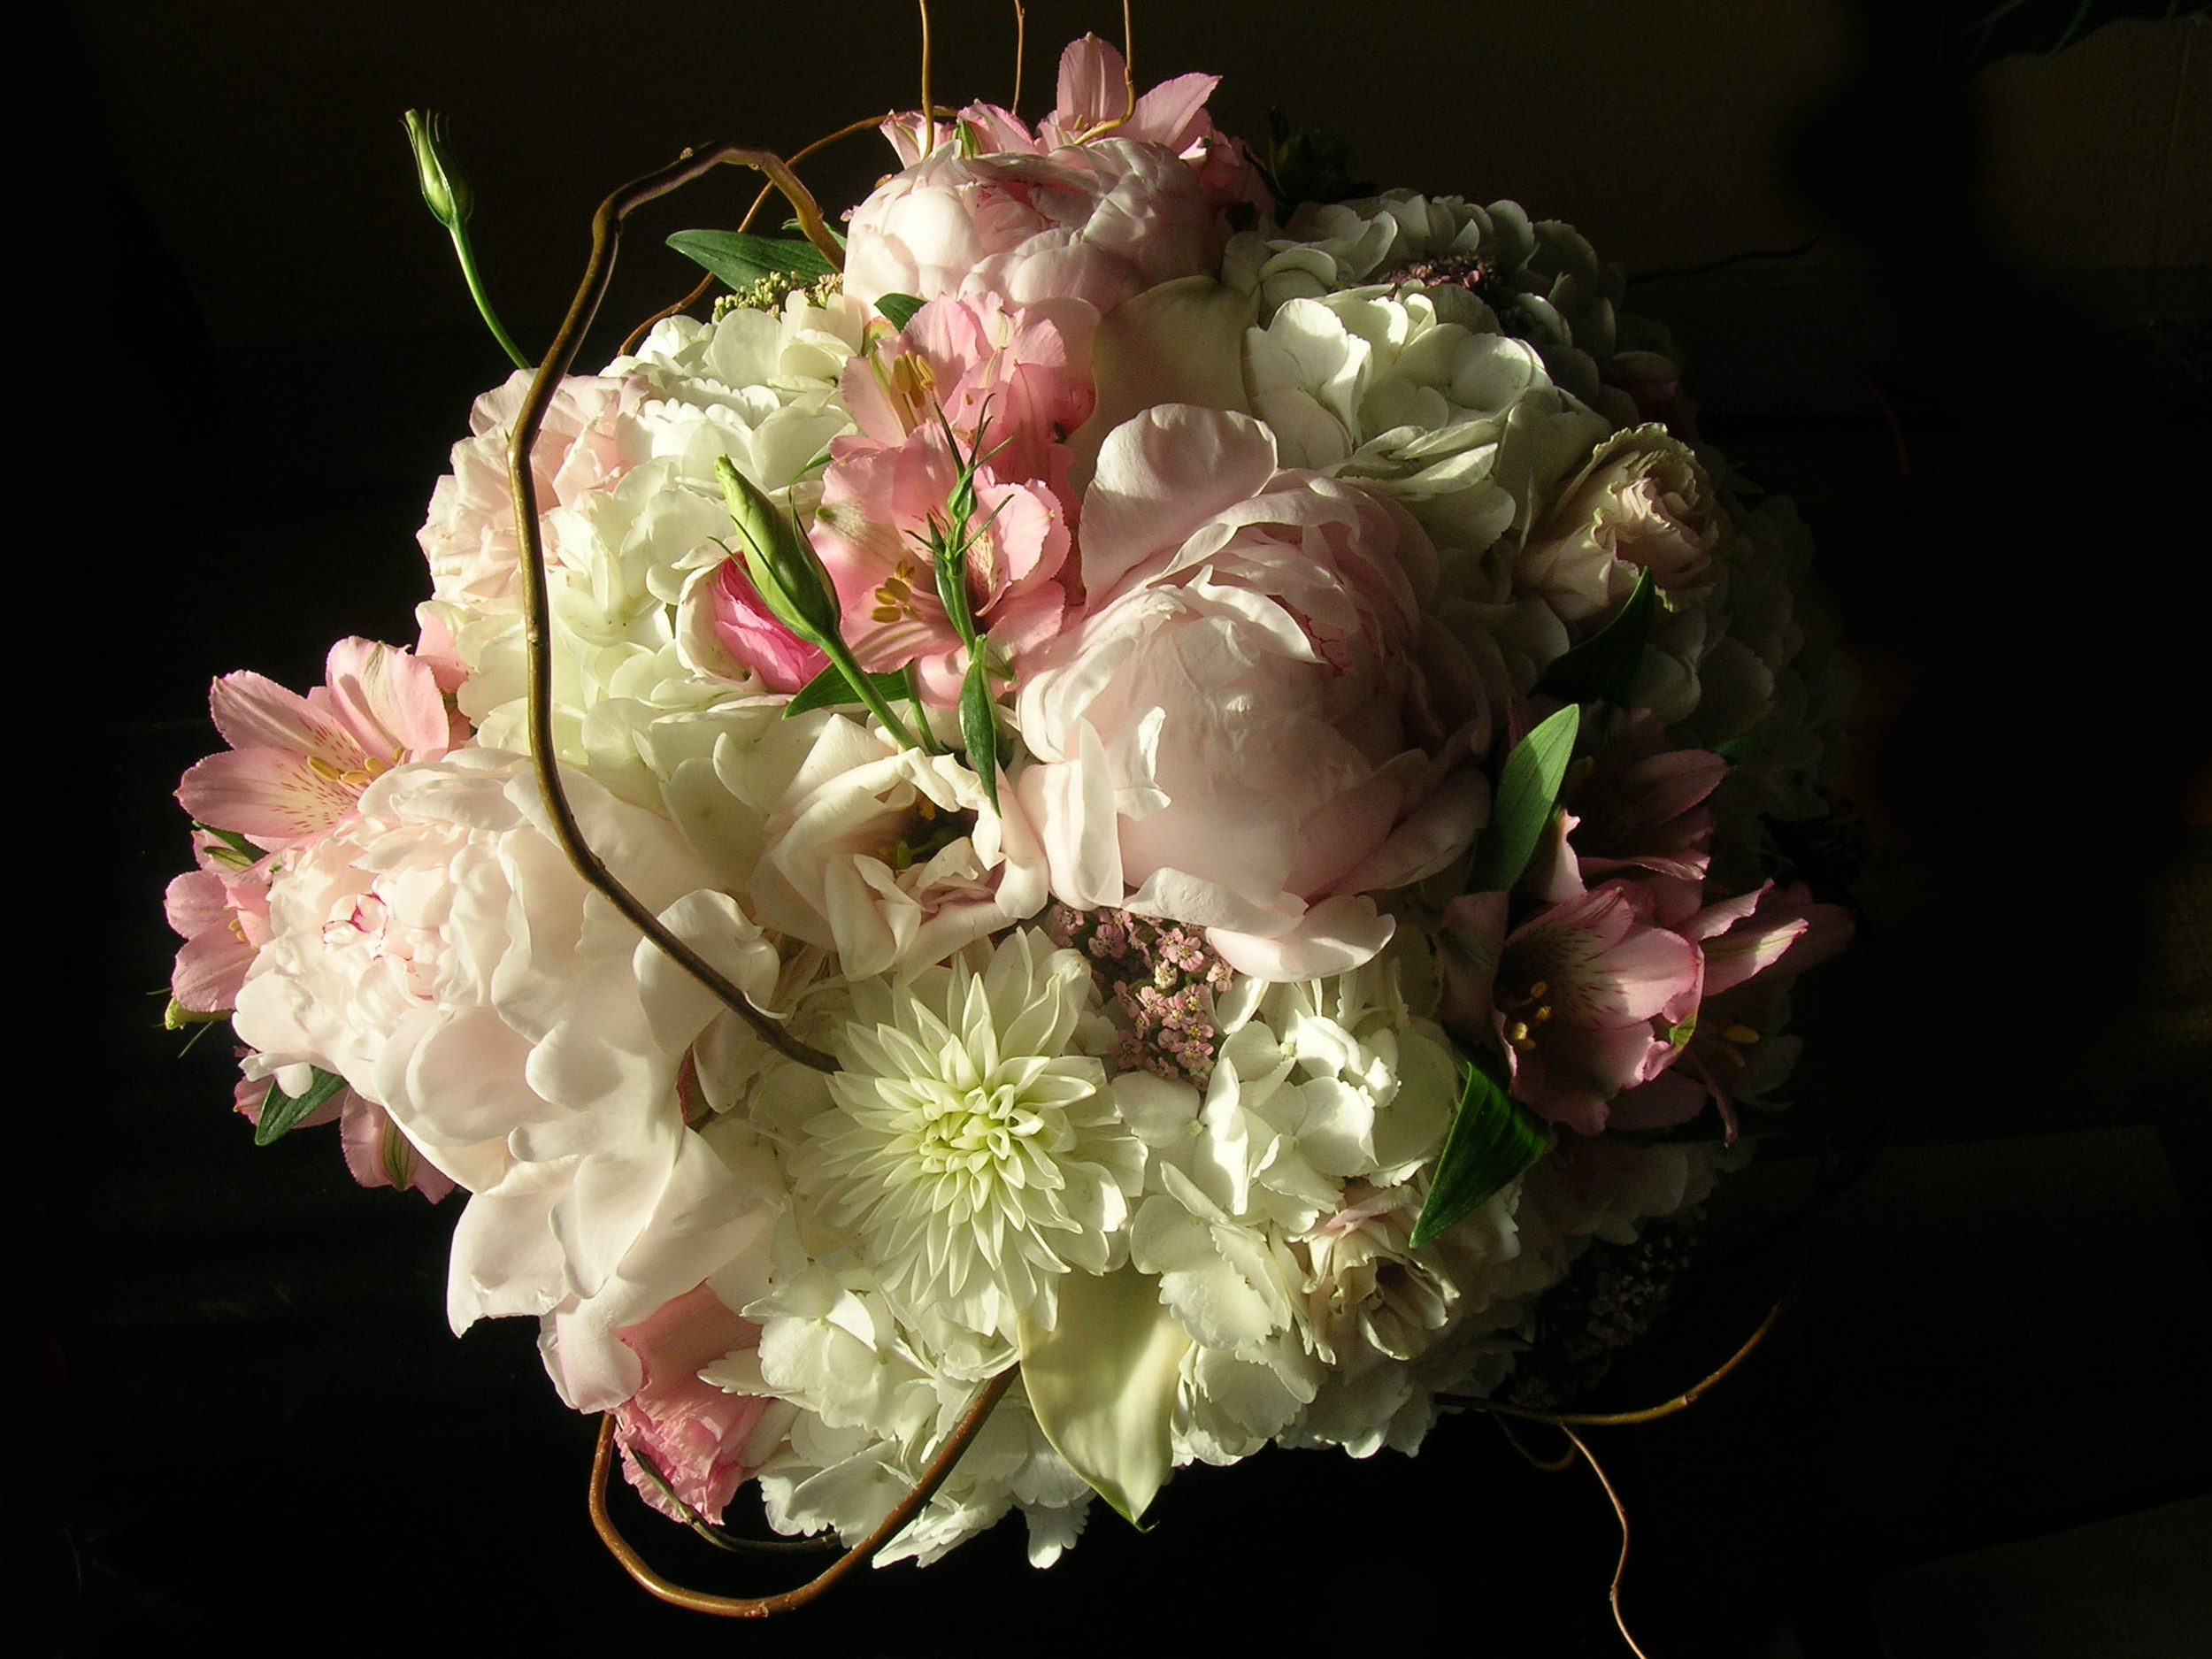 FlowerPhoto.jpg